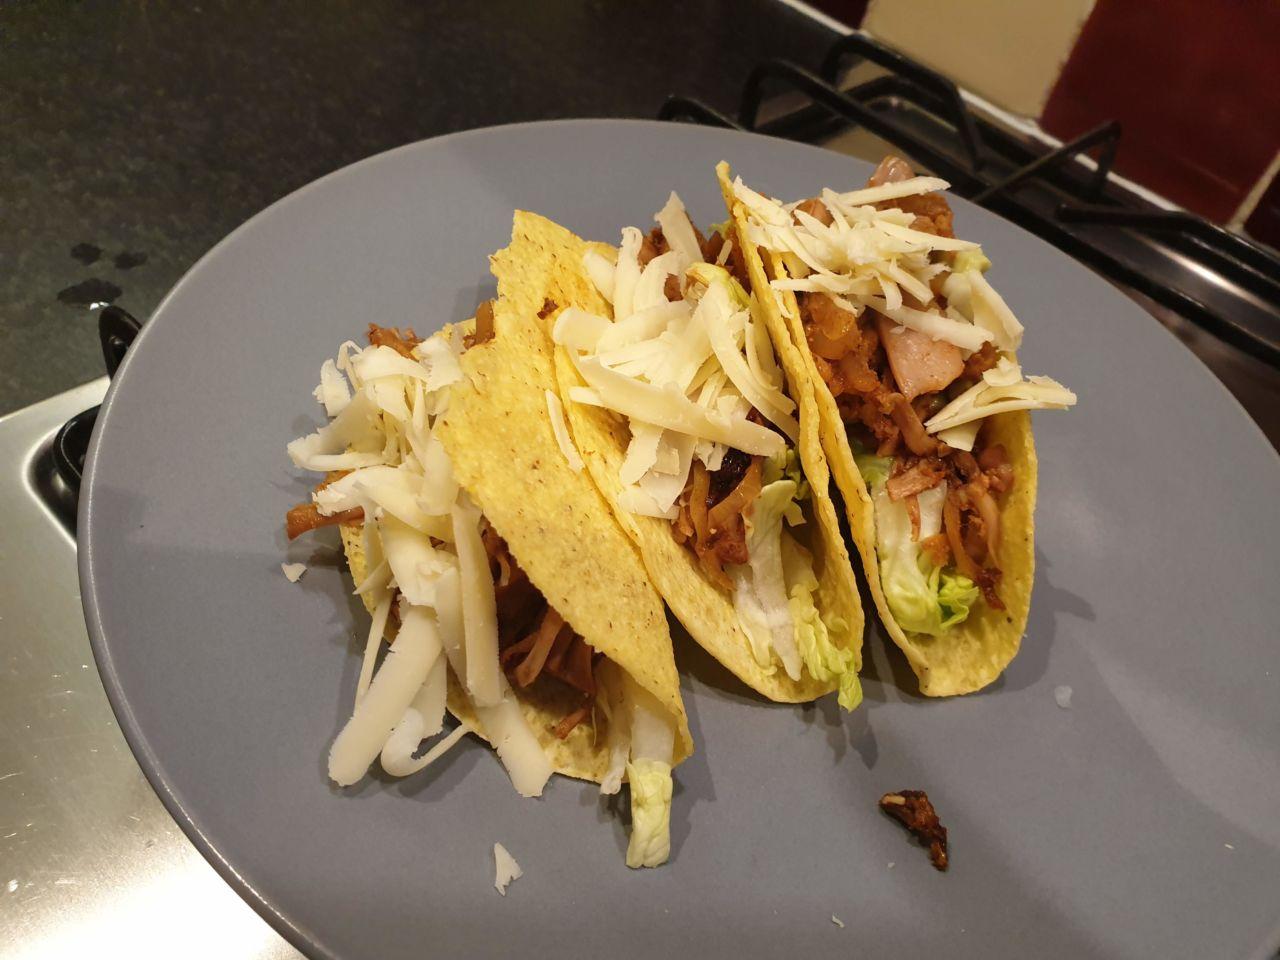 Bosh! Jackfruit tacos